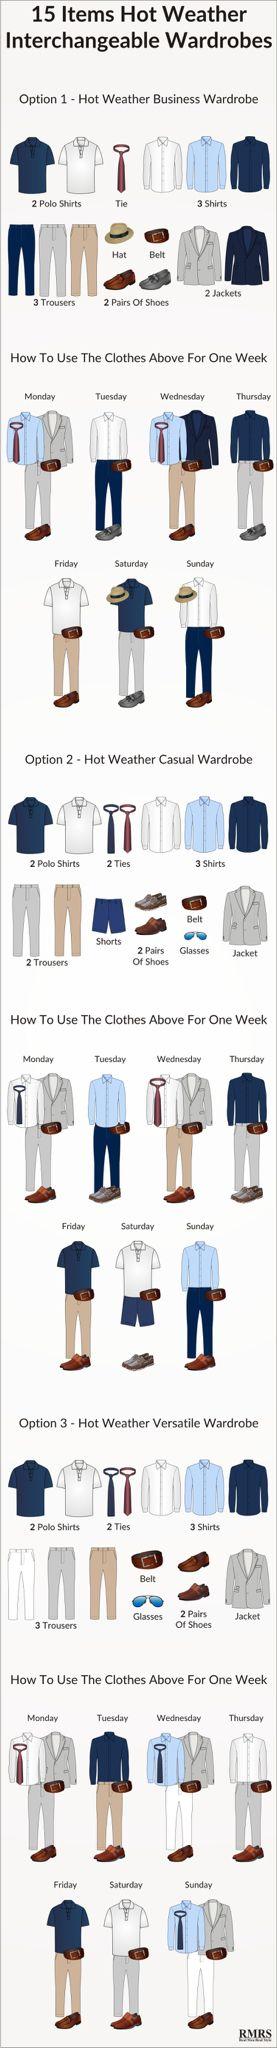 Interchangeable wardrobes